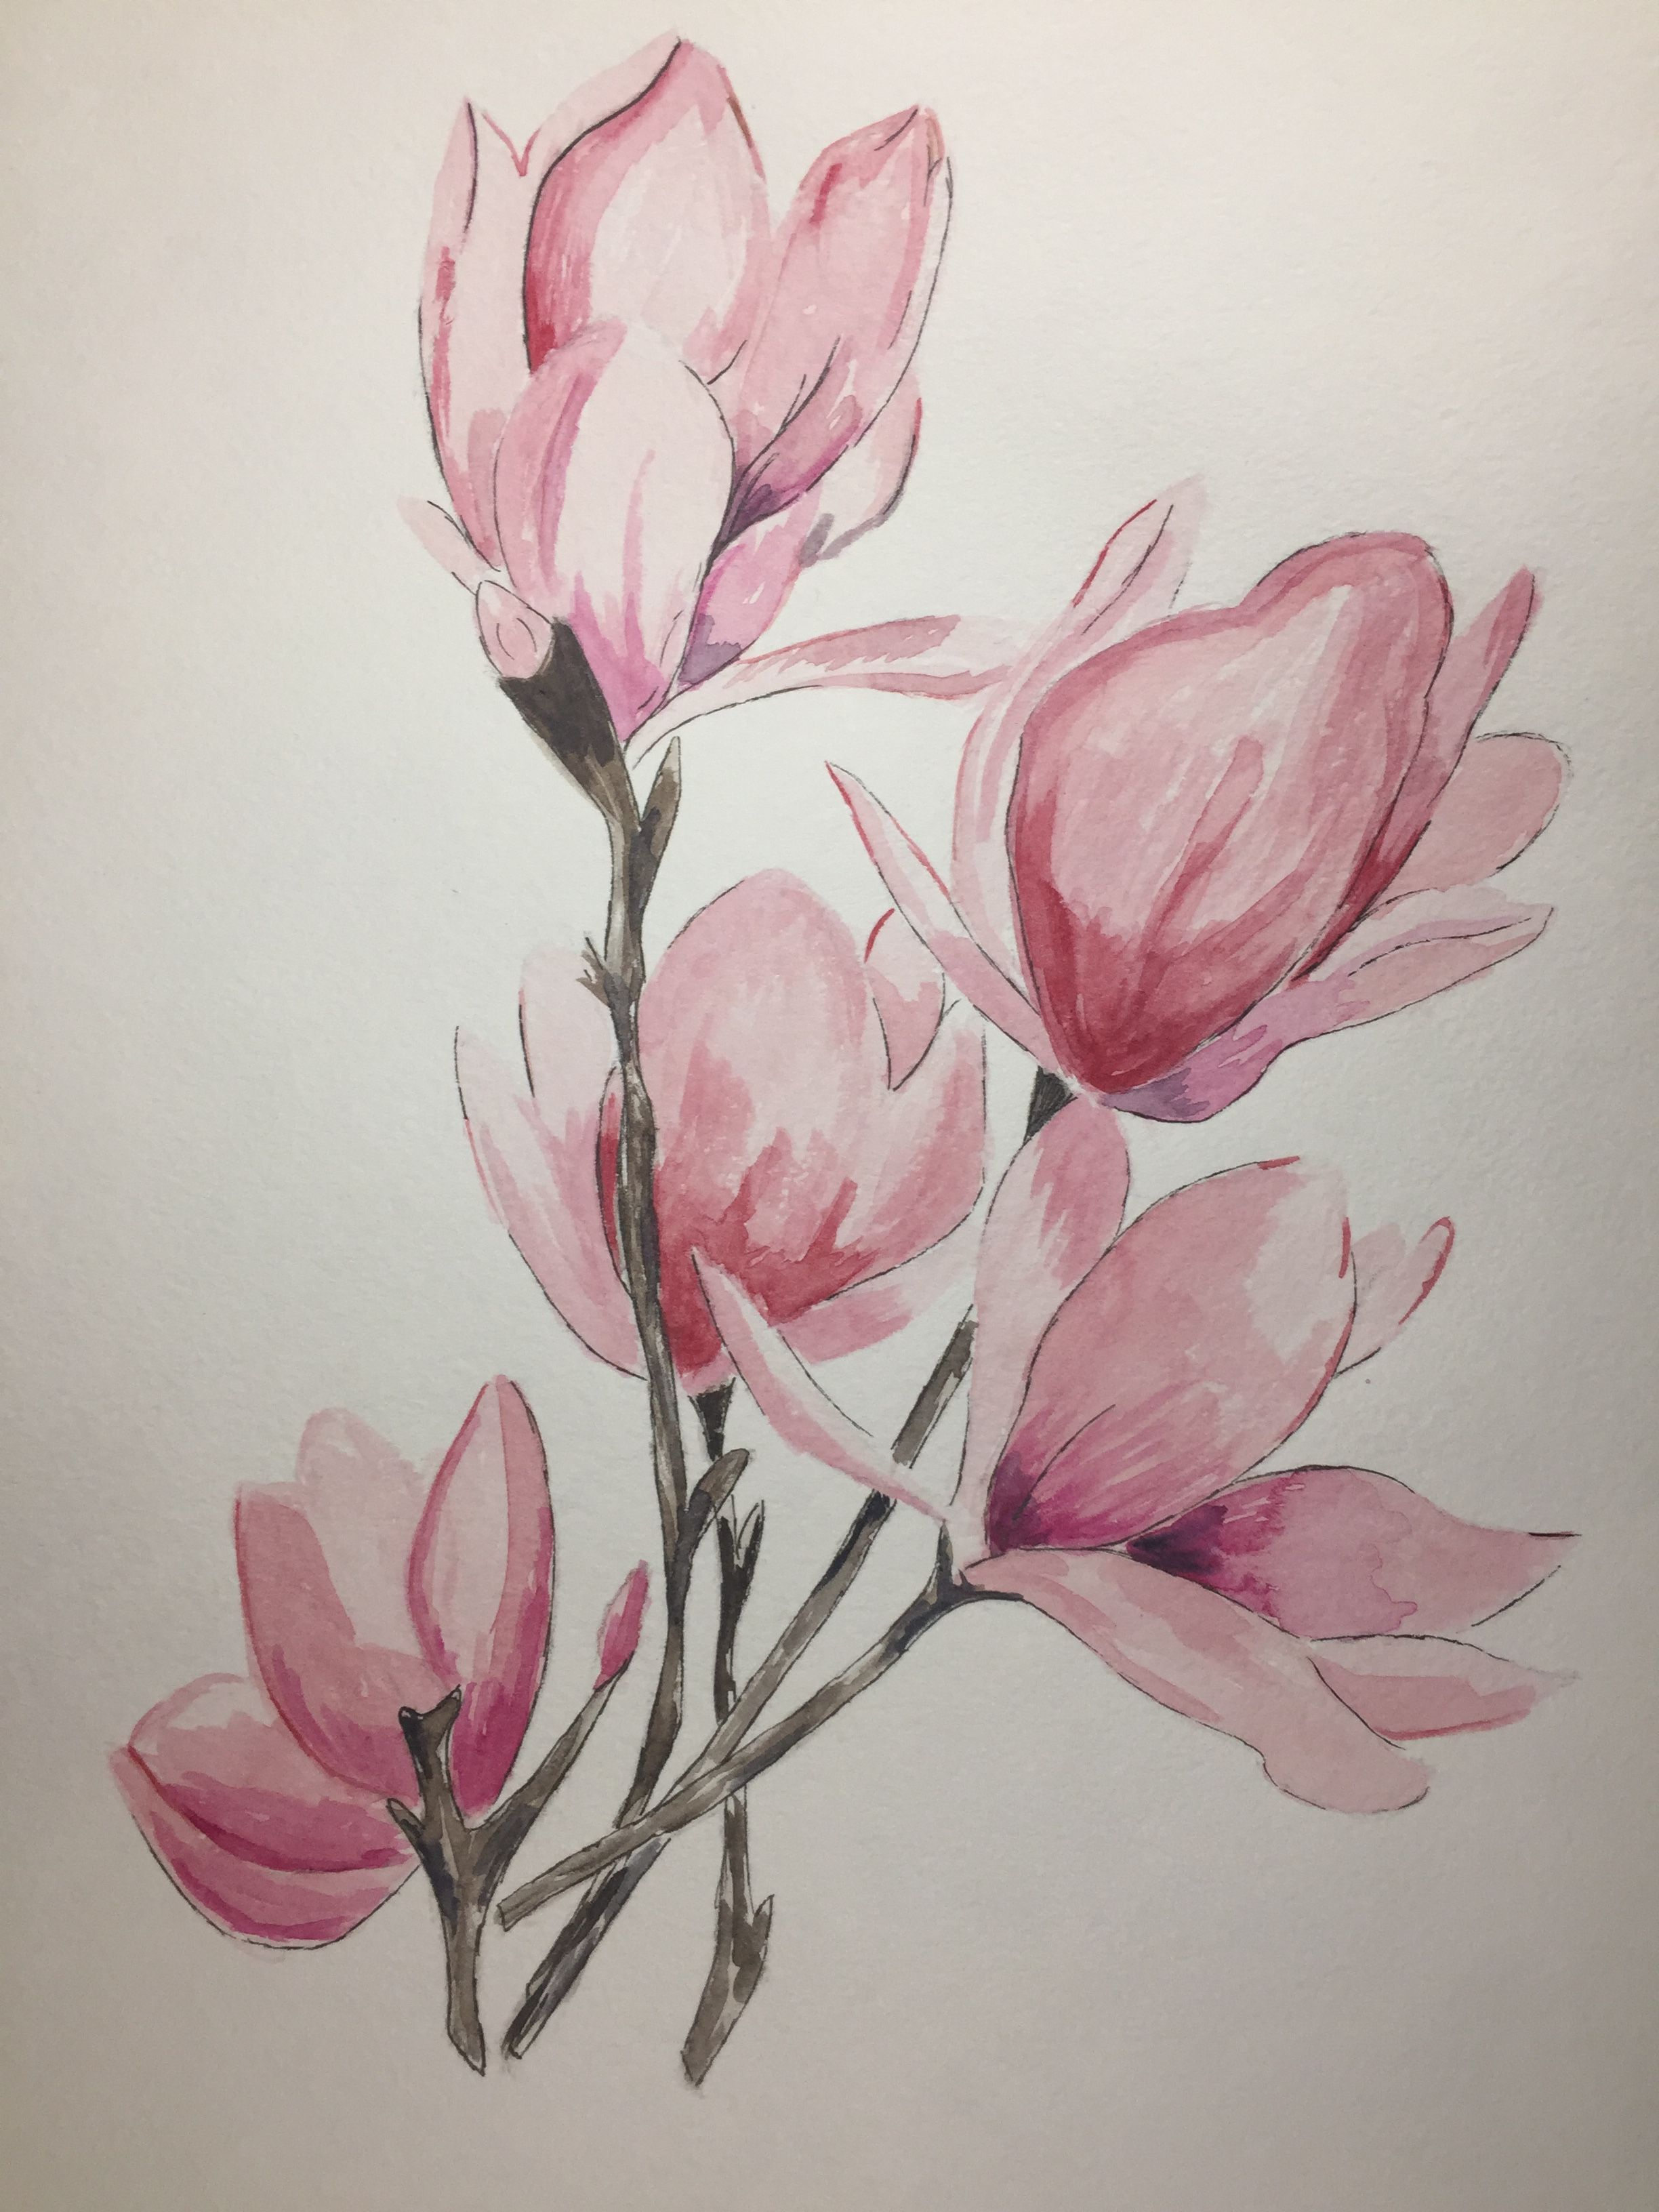 Magnolia By Eva Moskovskaya Watercolor 卡片 Painting Art